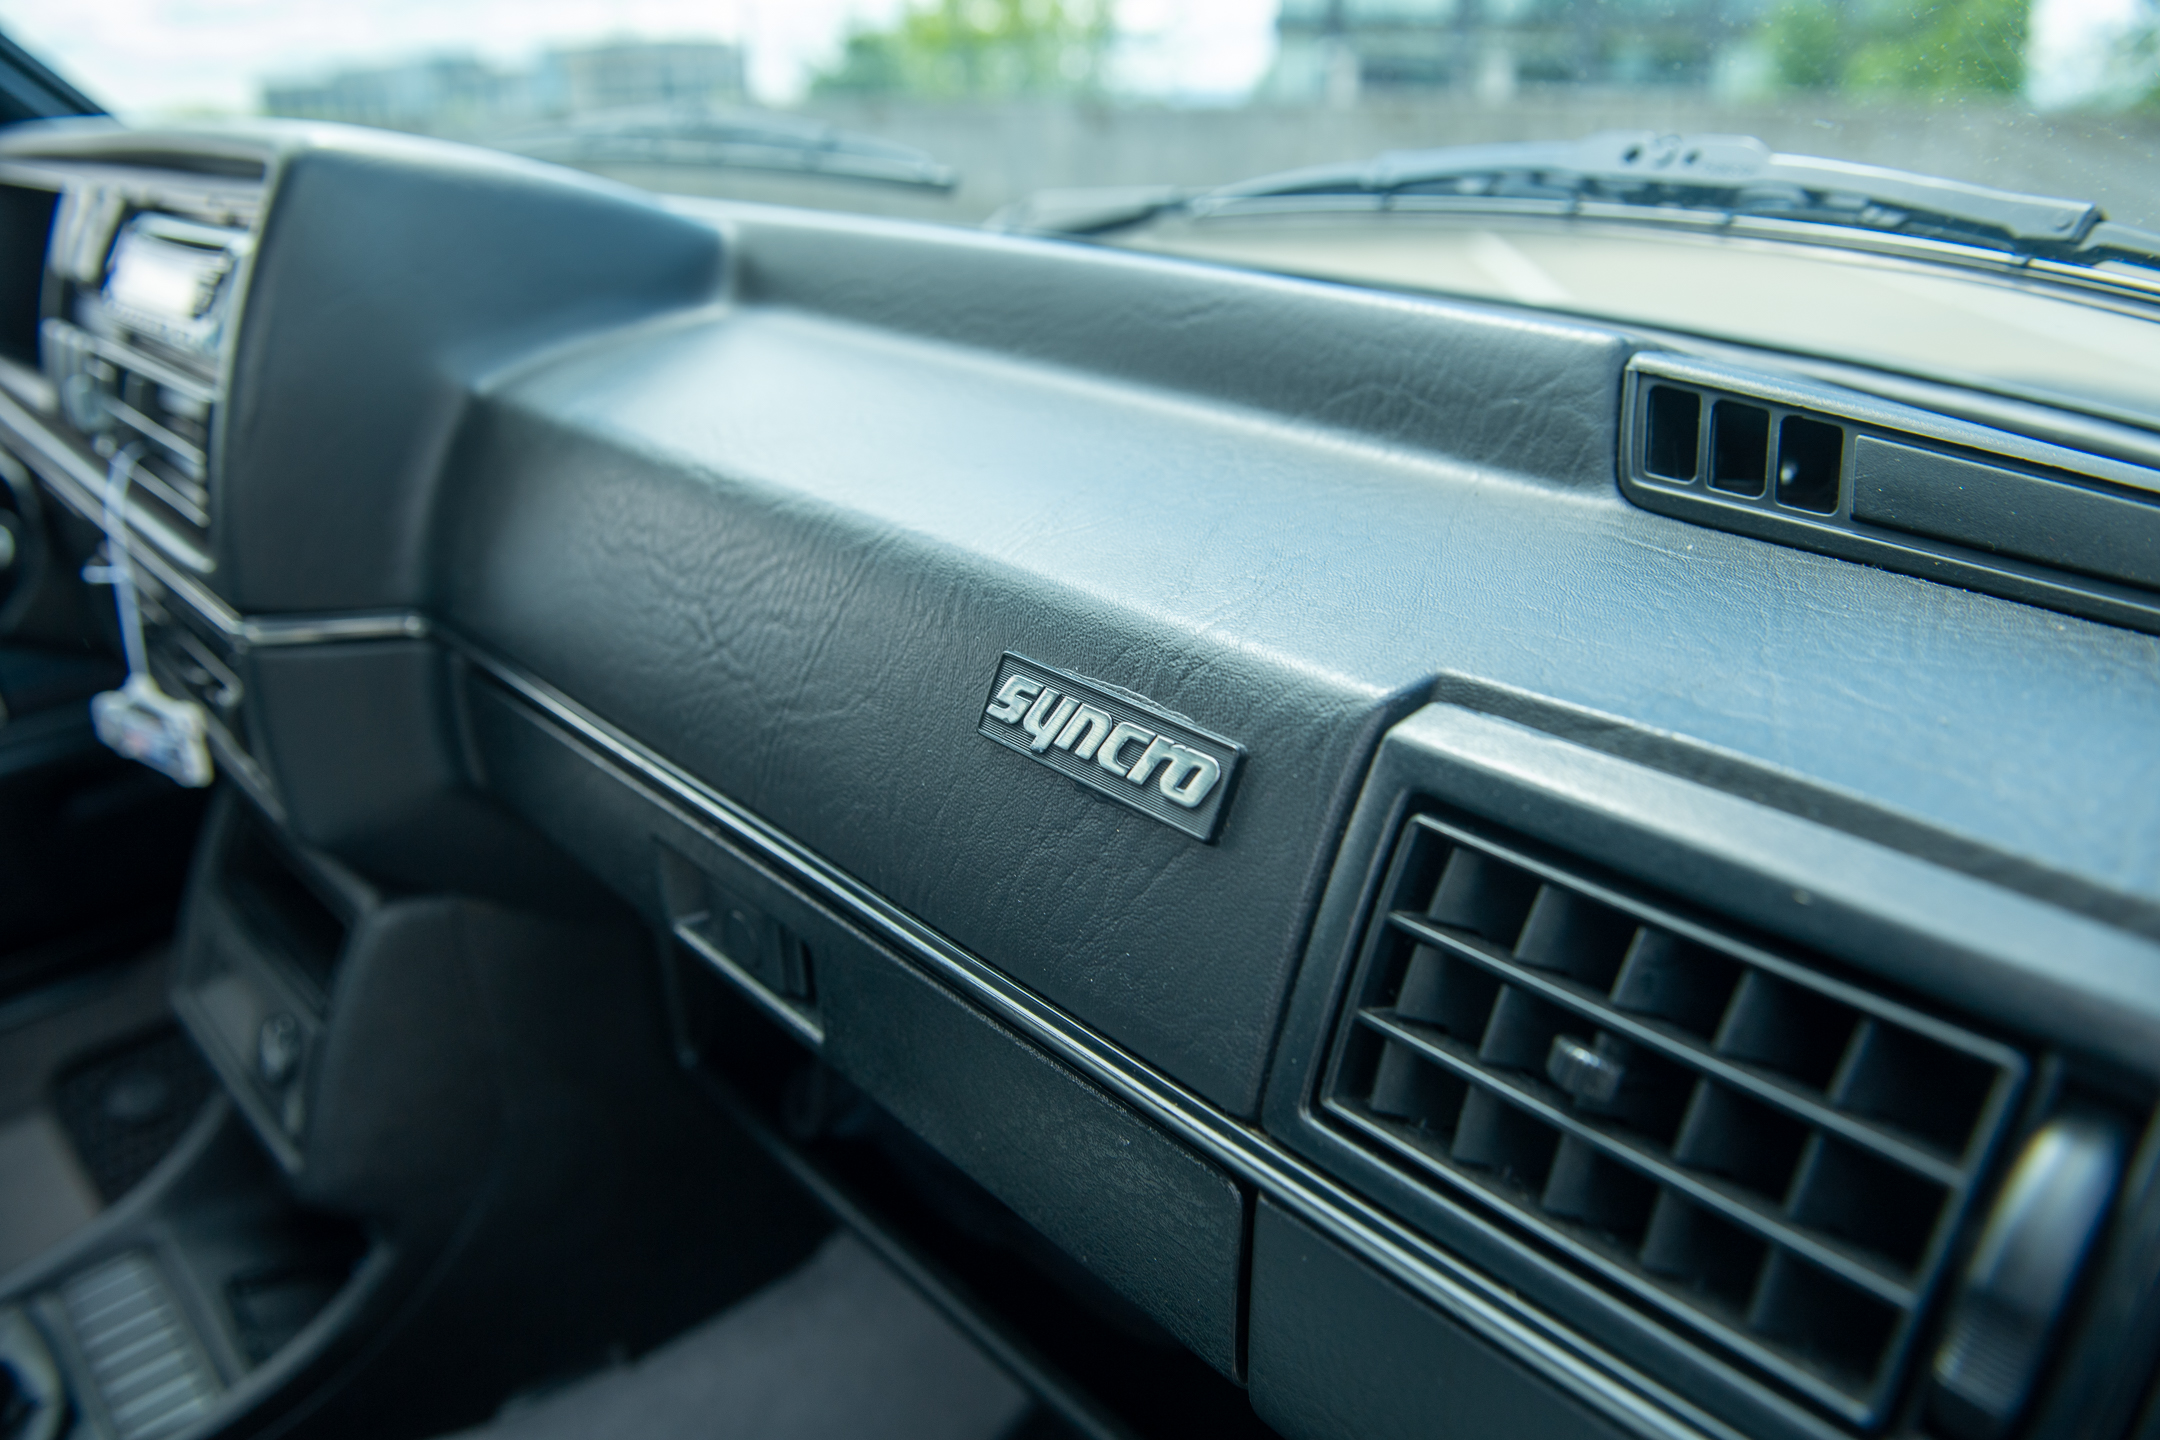 Volkswagen Golf Country synchro dashboard badge